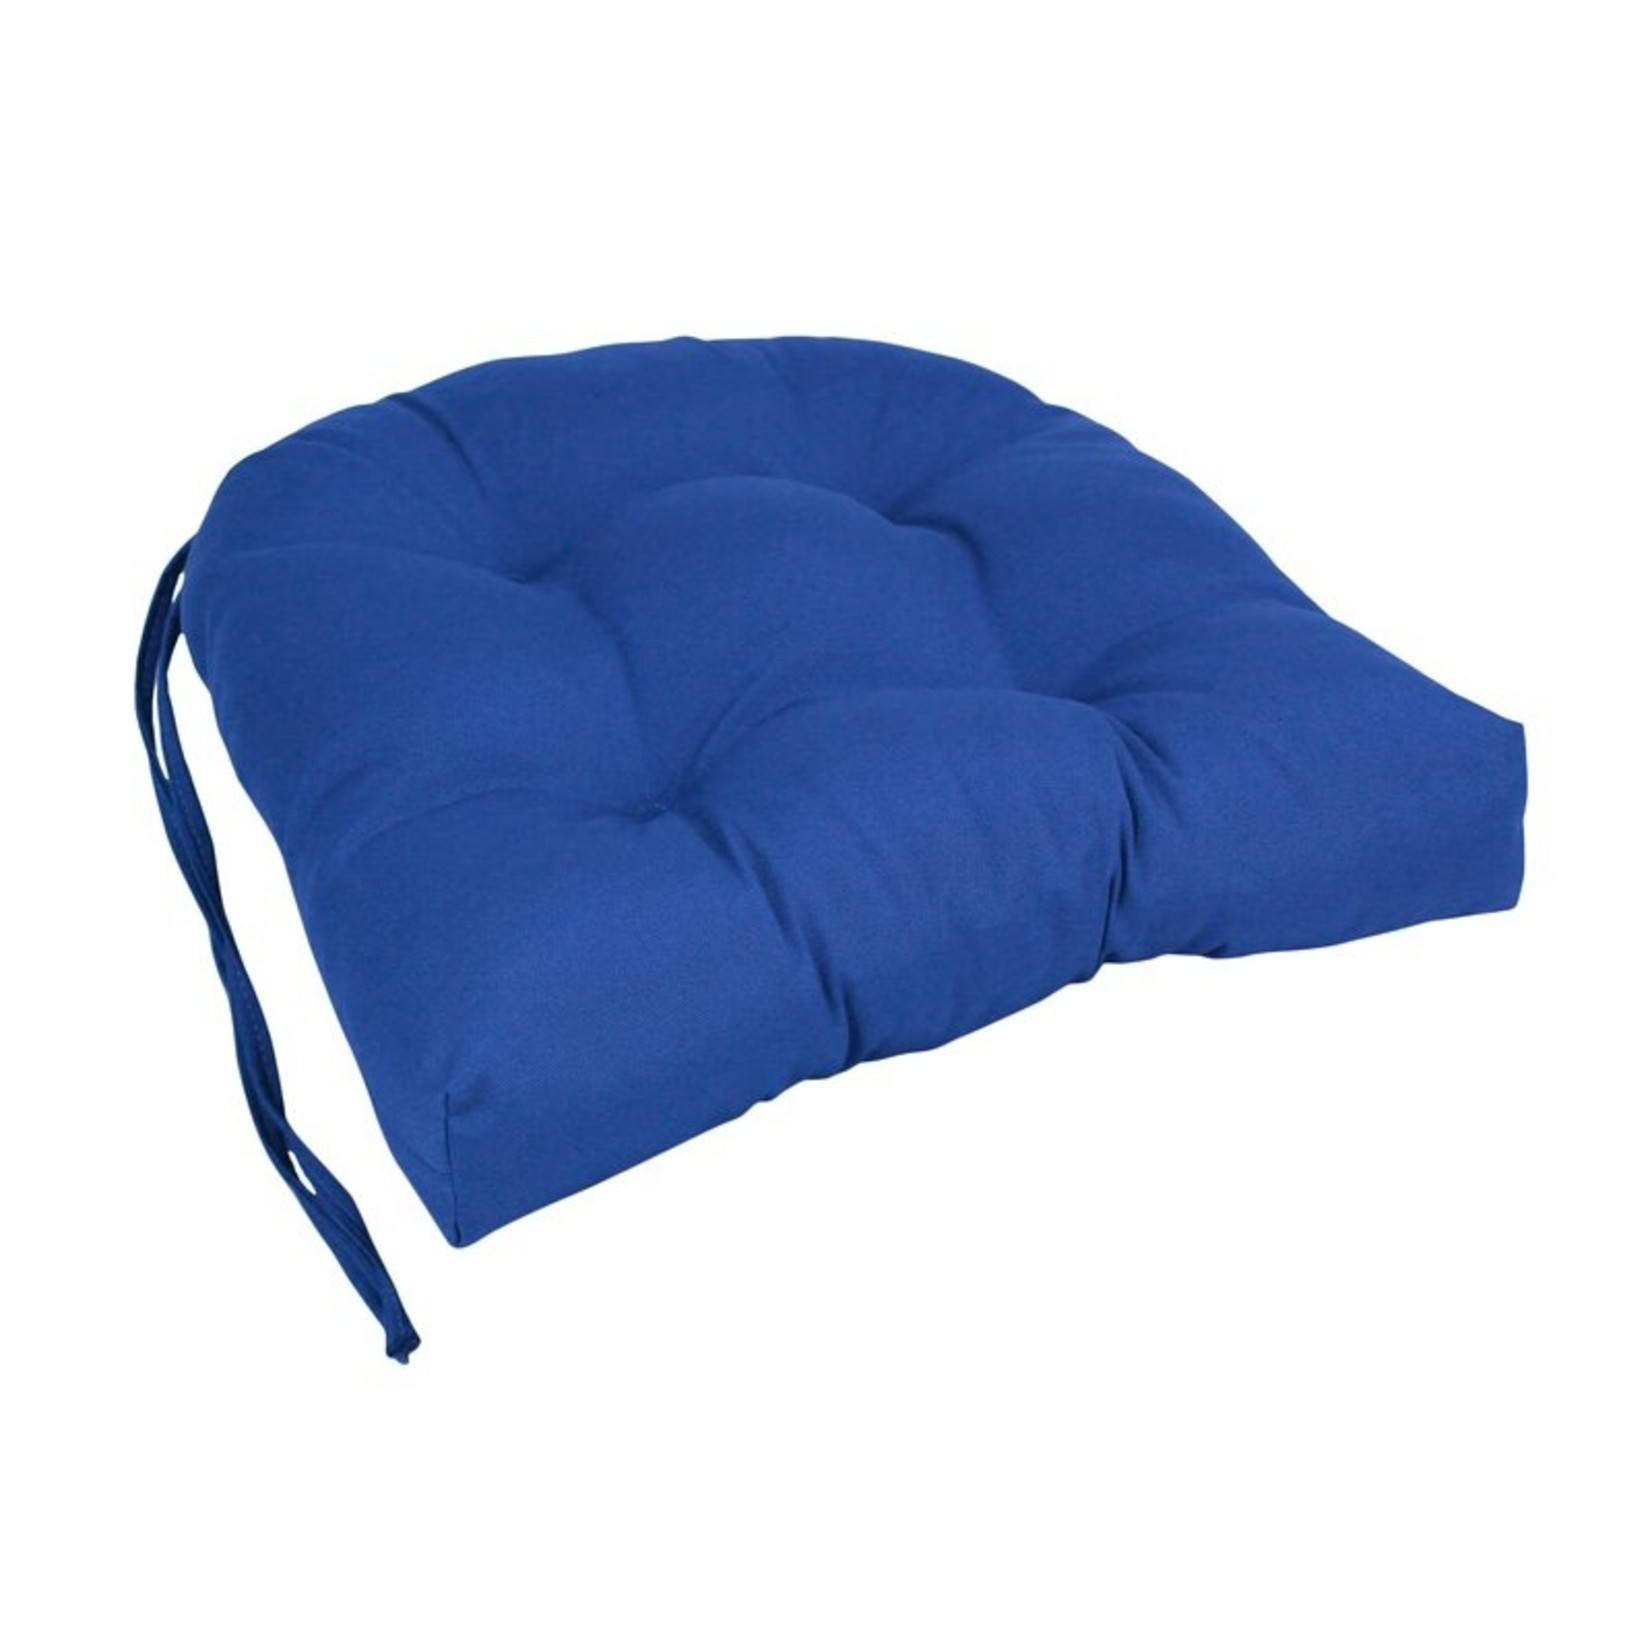 *Chair Pad Cushion - Royal Blue - Set of 4